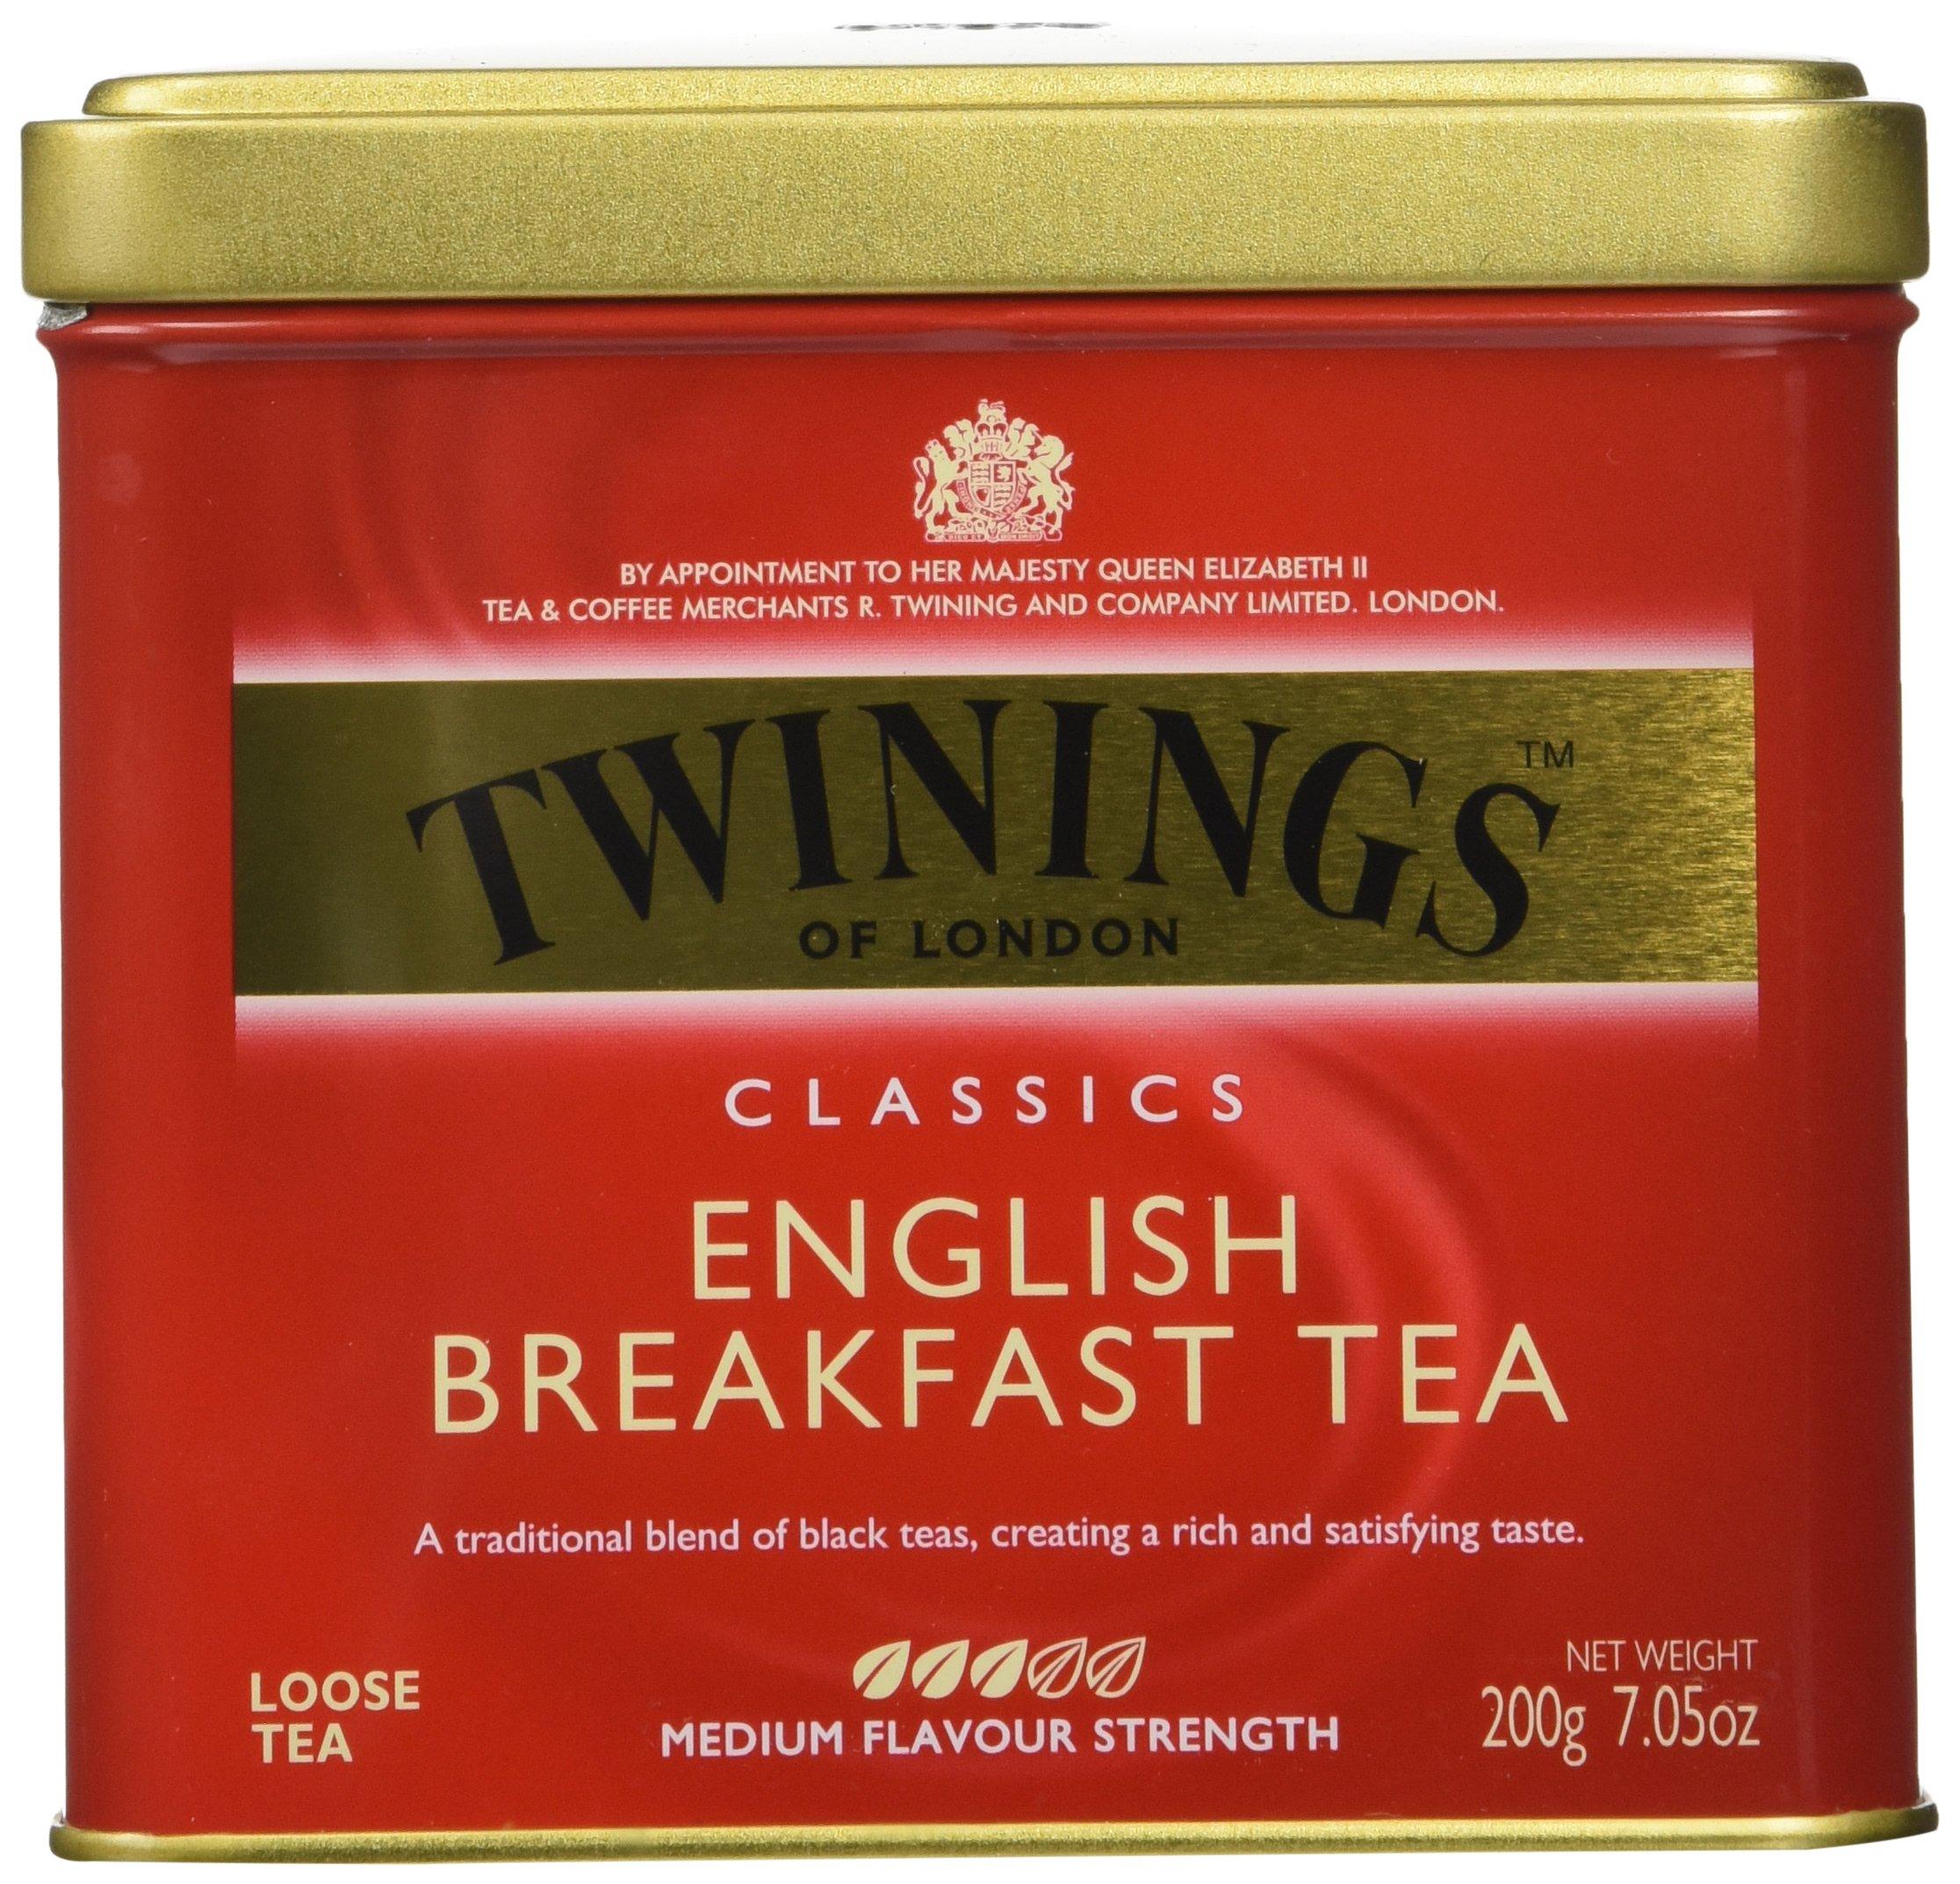 Twinings English Breakfast Tea, Loose Tea, 7.05 oz Tins by Twinings (Image #1)